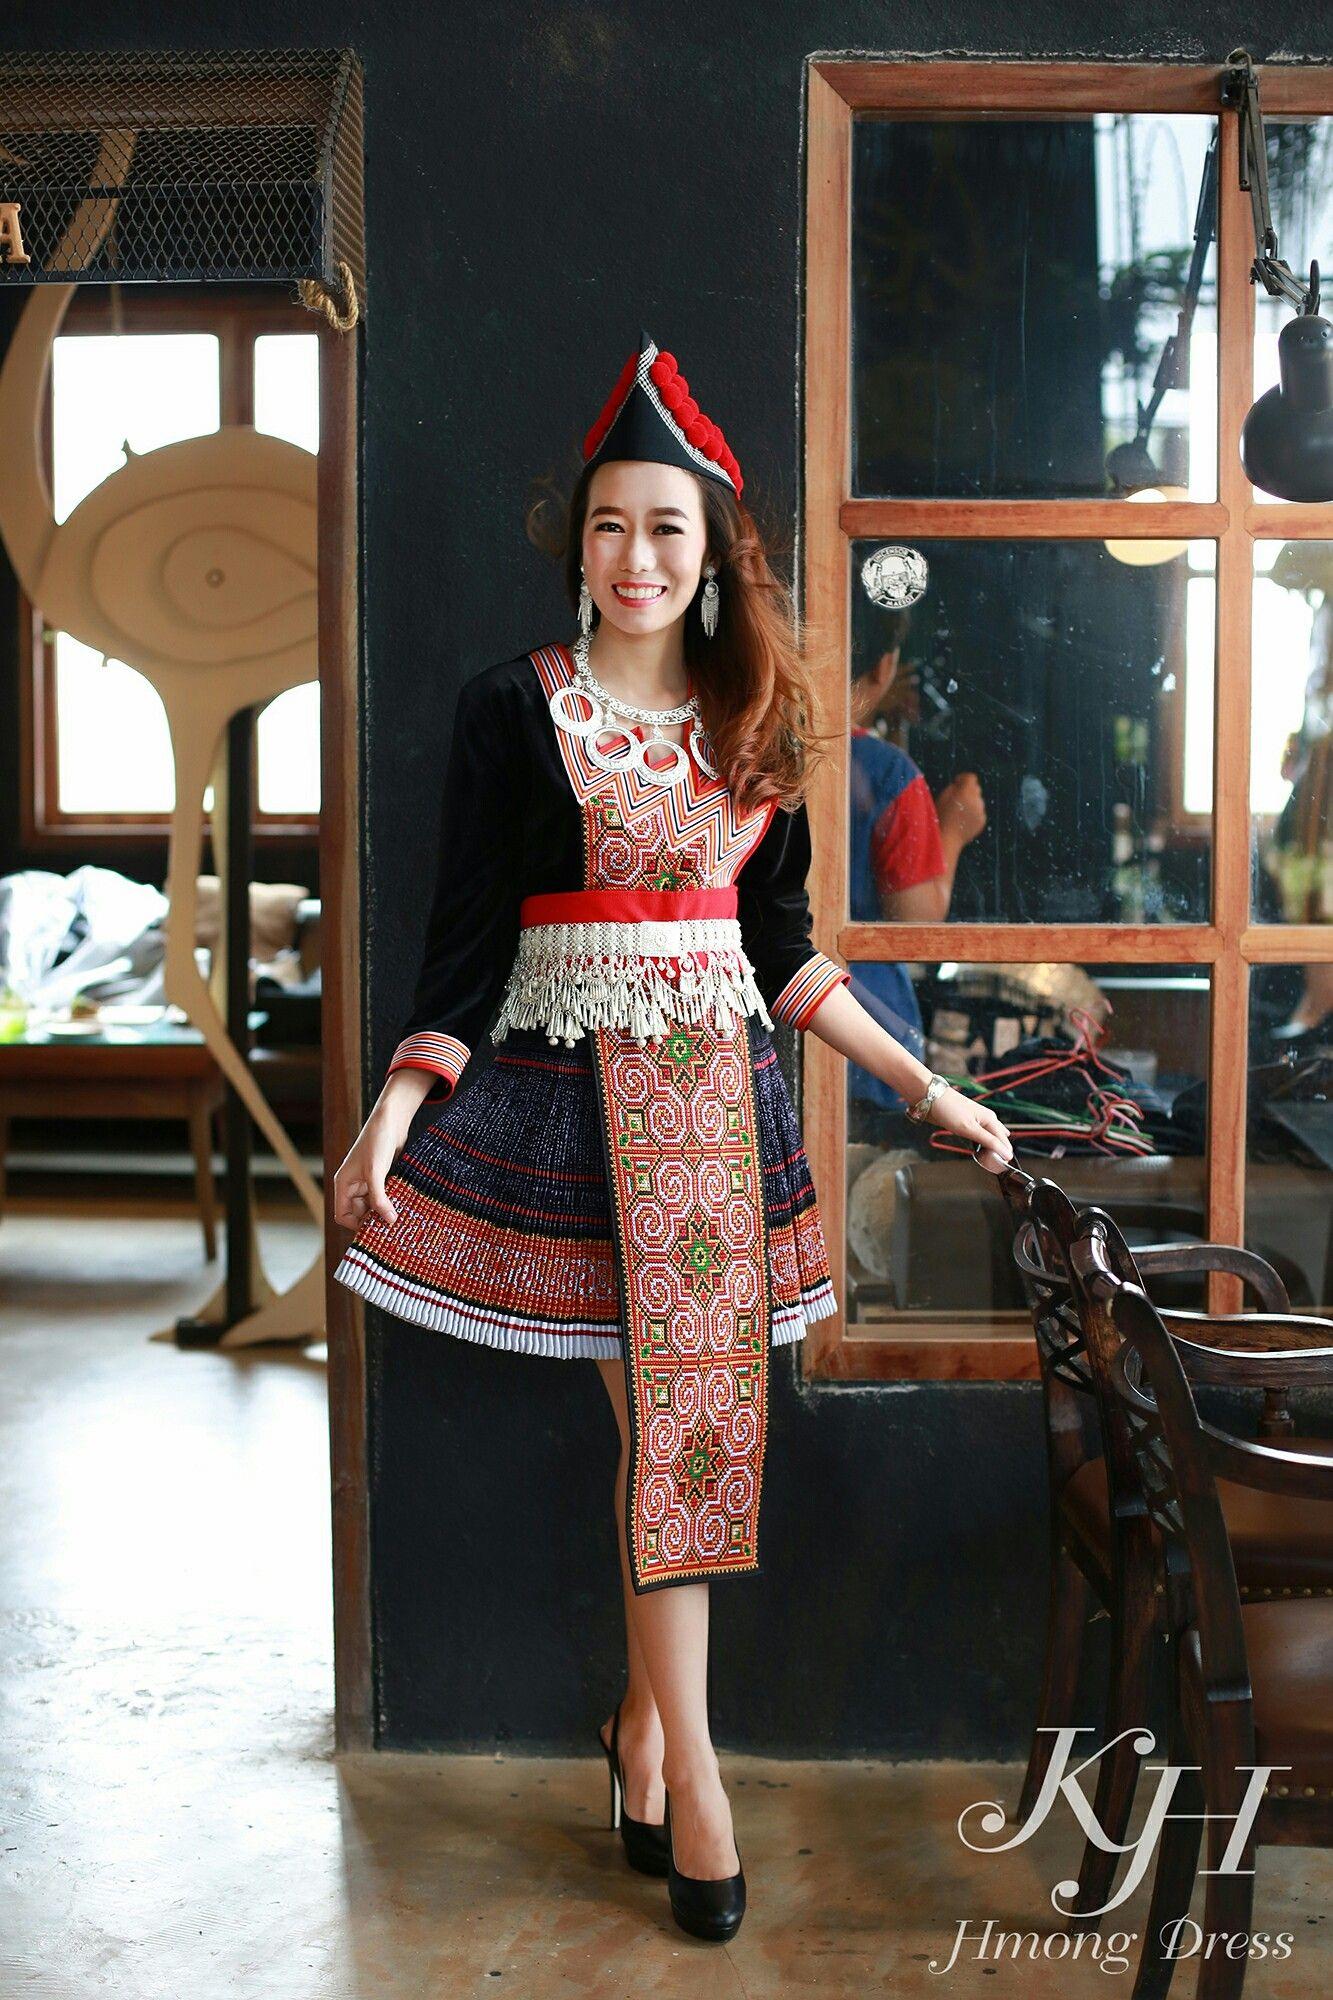 Hmong Clothing From Kh Hmong Dress Shop Pinteres